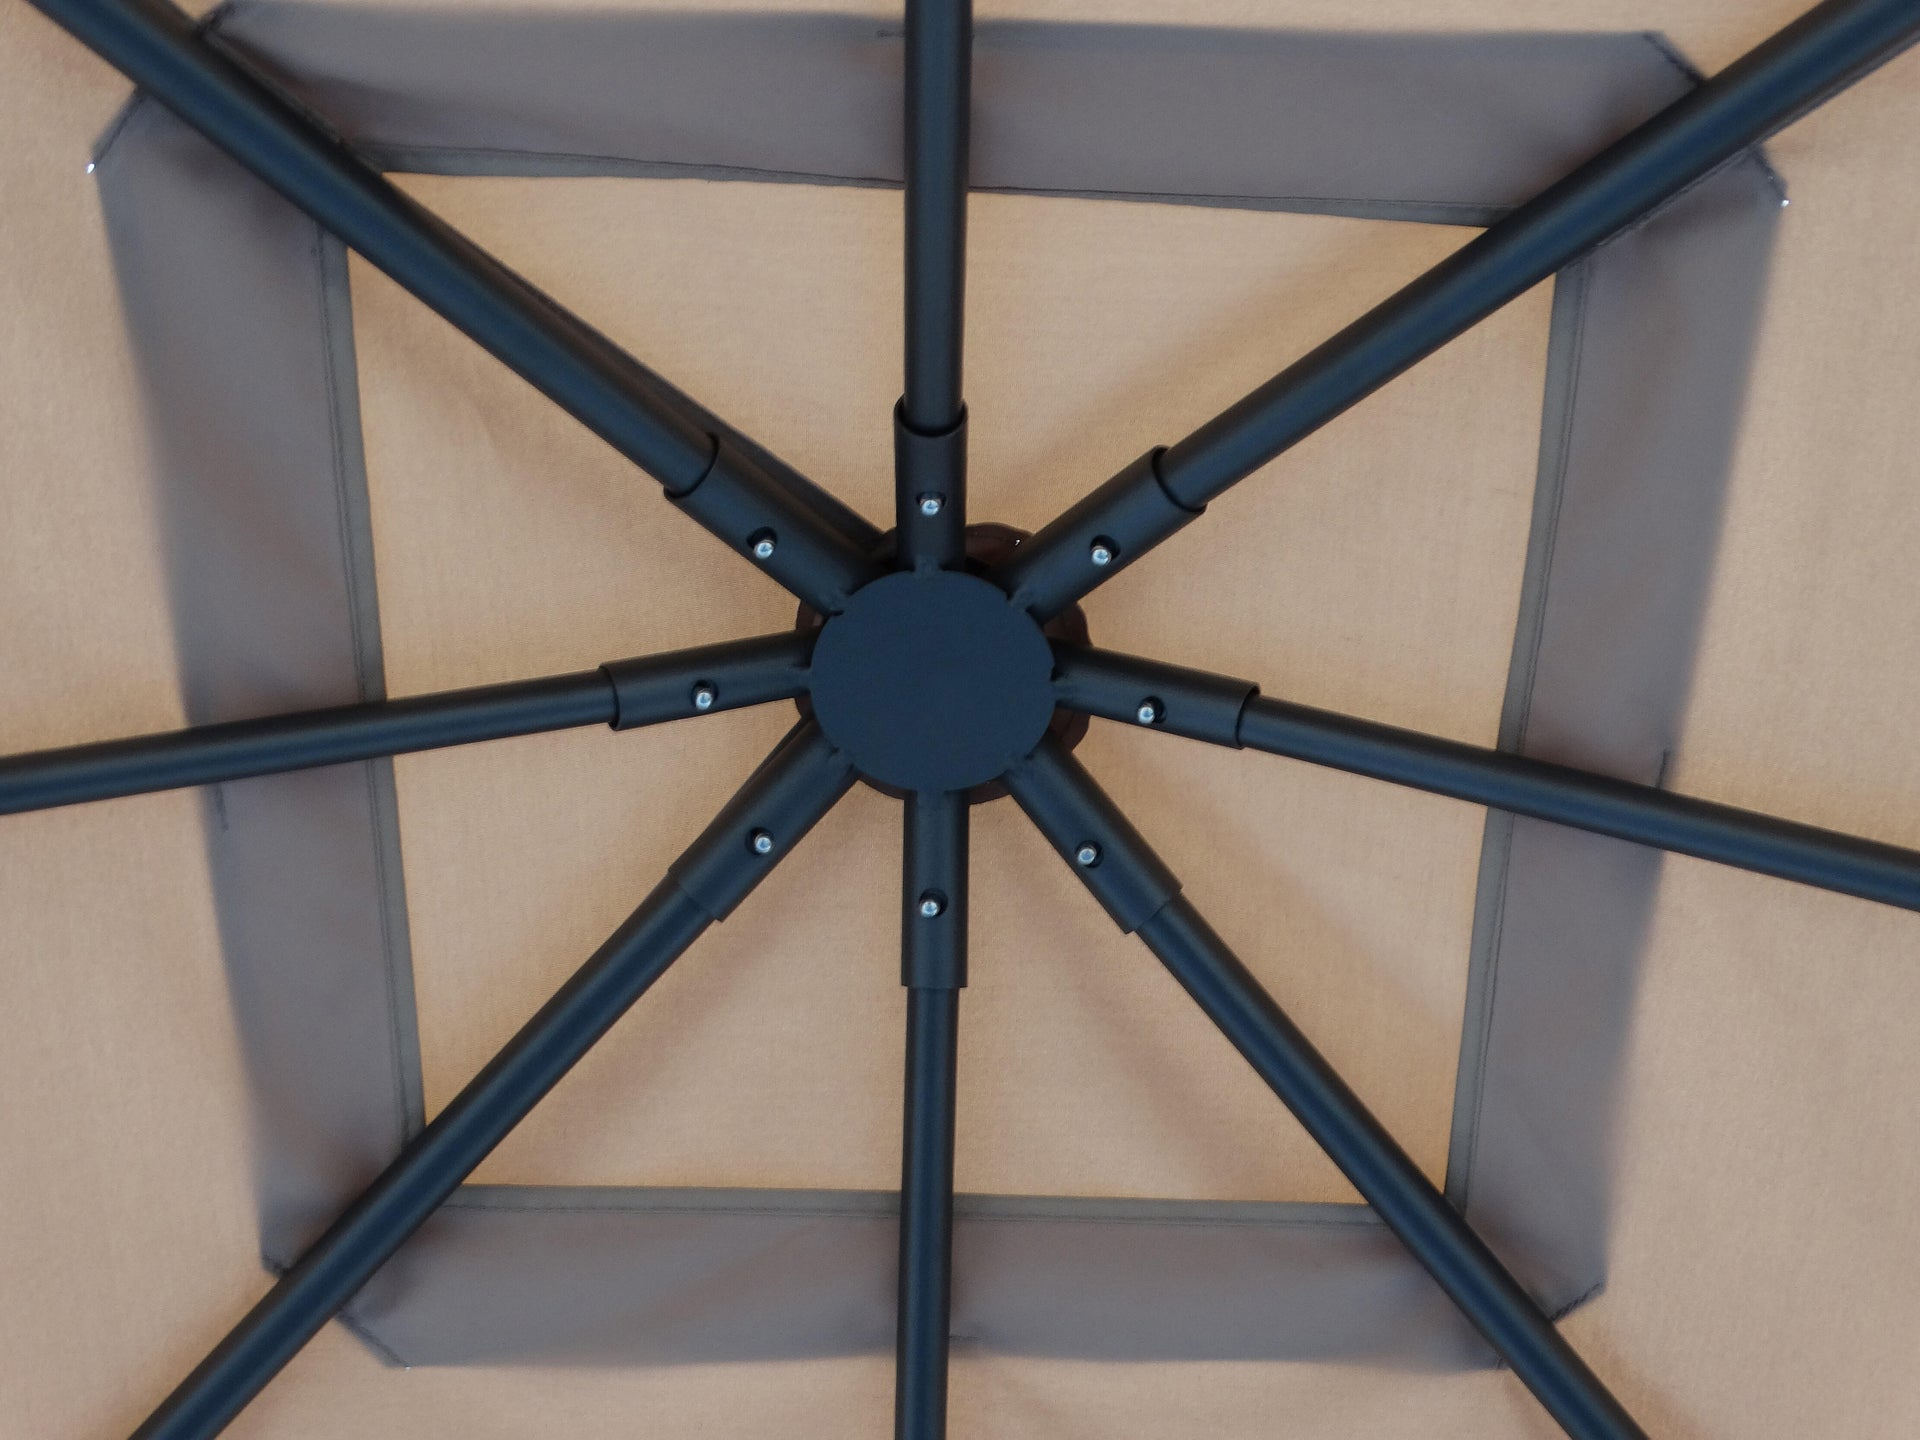 Gazebo acciaio Komo beige L 300 cm x P 300 cm, H 2.6 m - 3